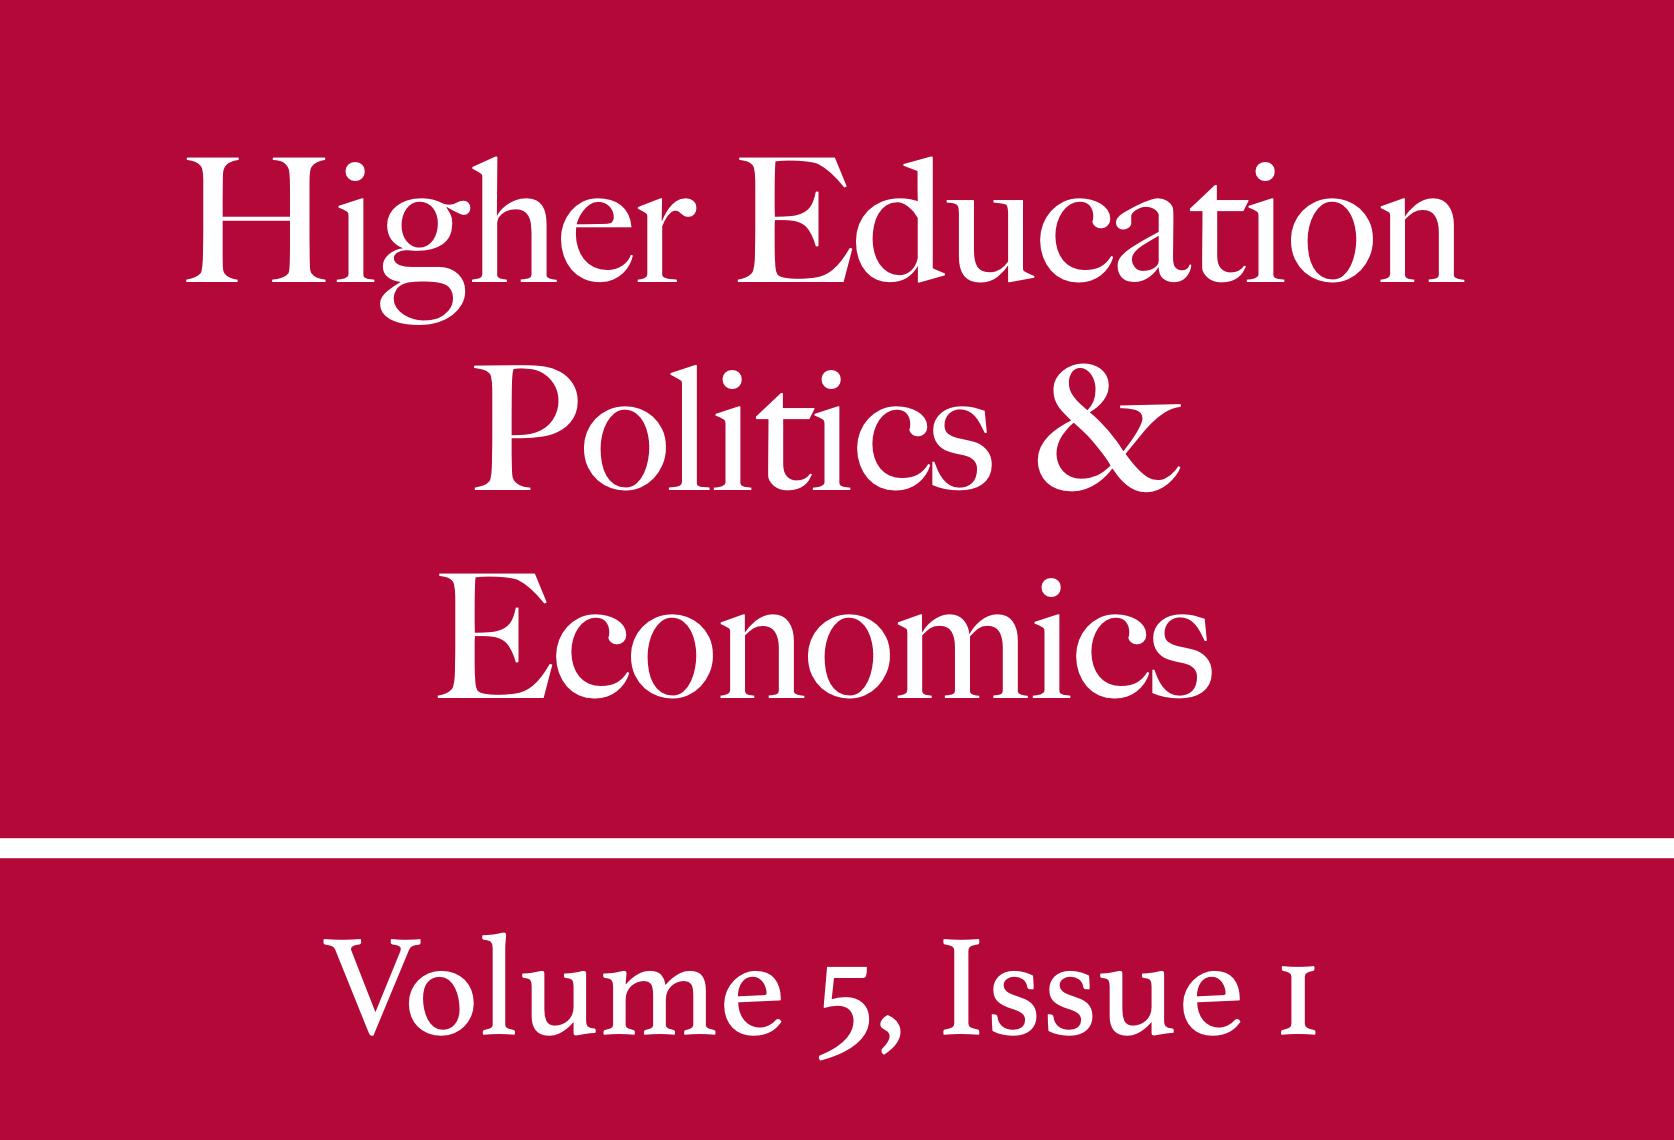 HEPE Volume 5, Issue 1